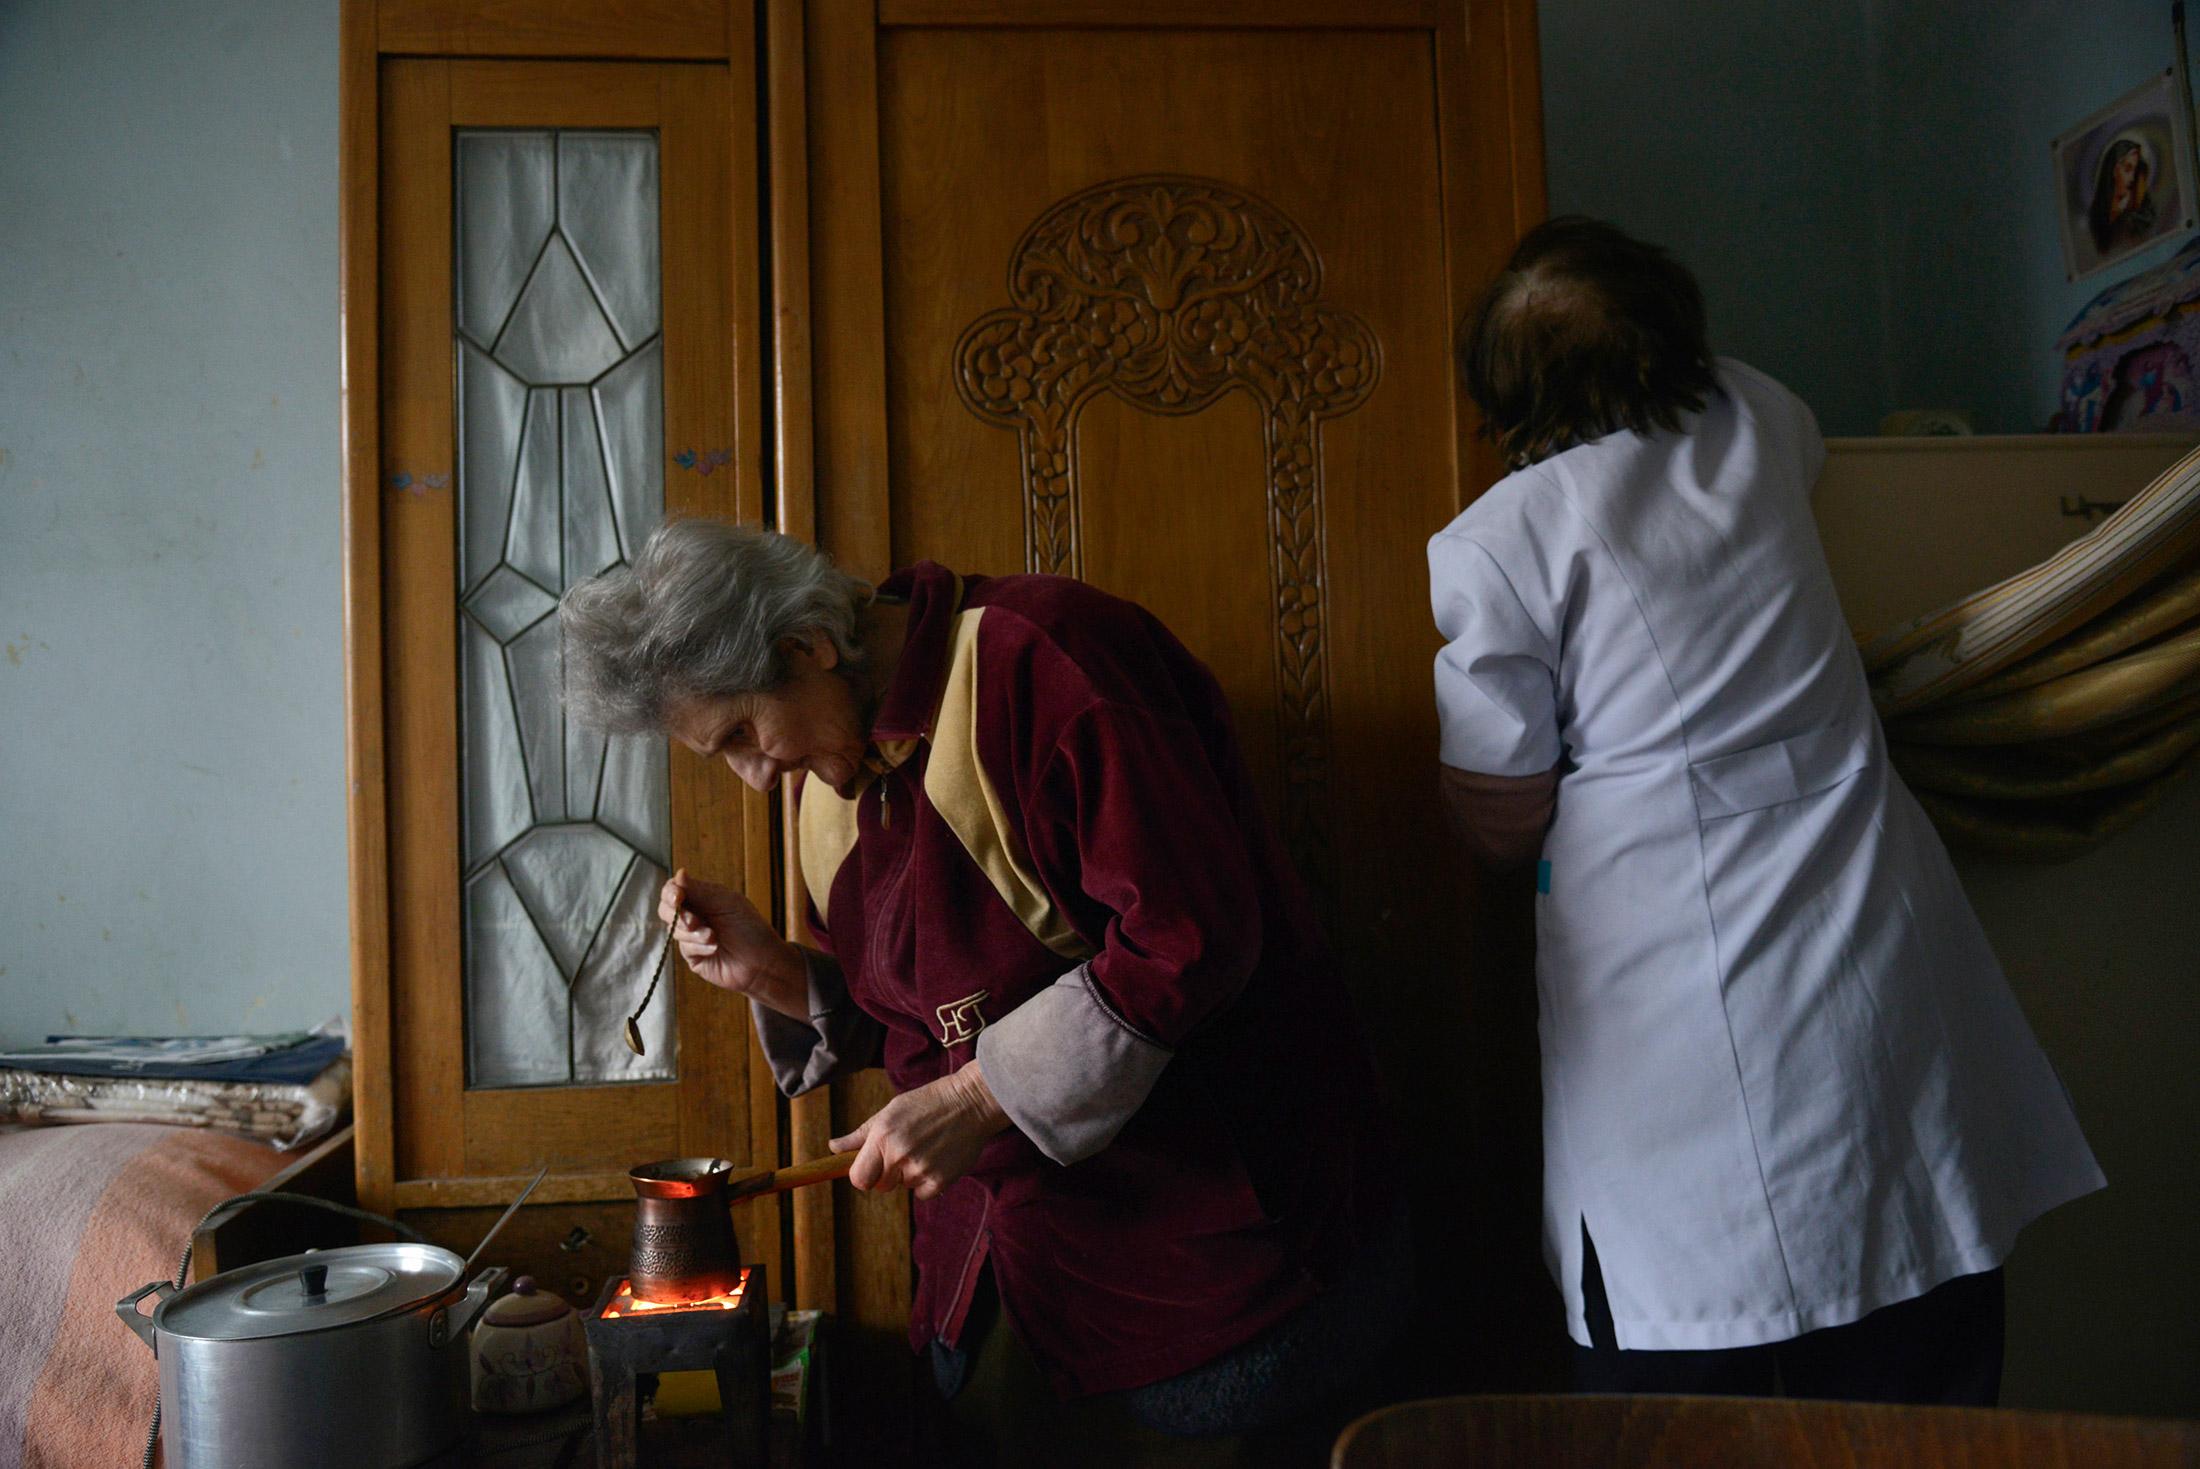 Julia Khachaturova prepares a modest treat while Sveta works.